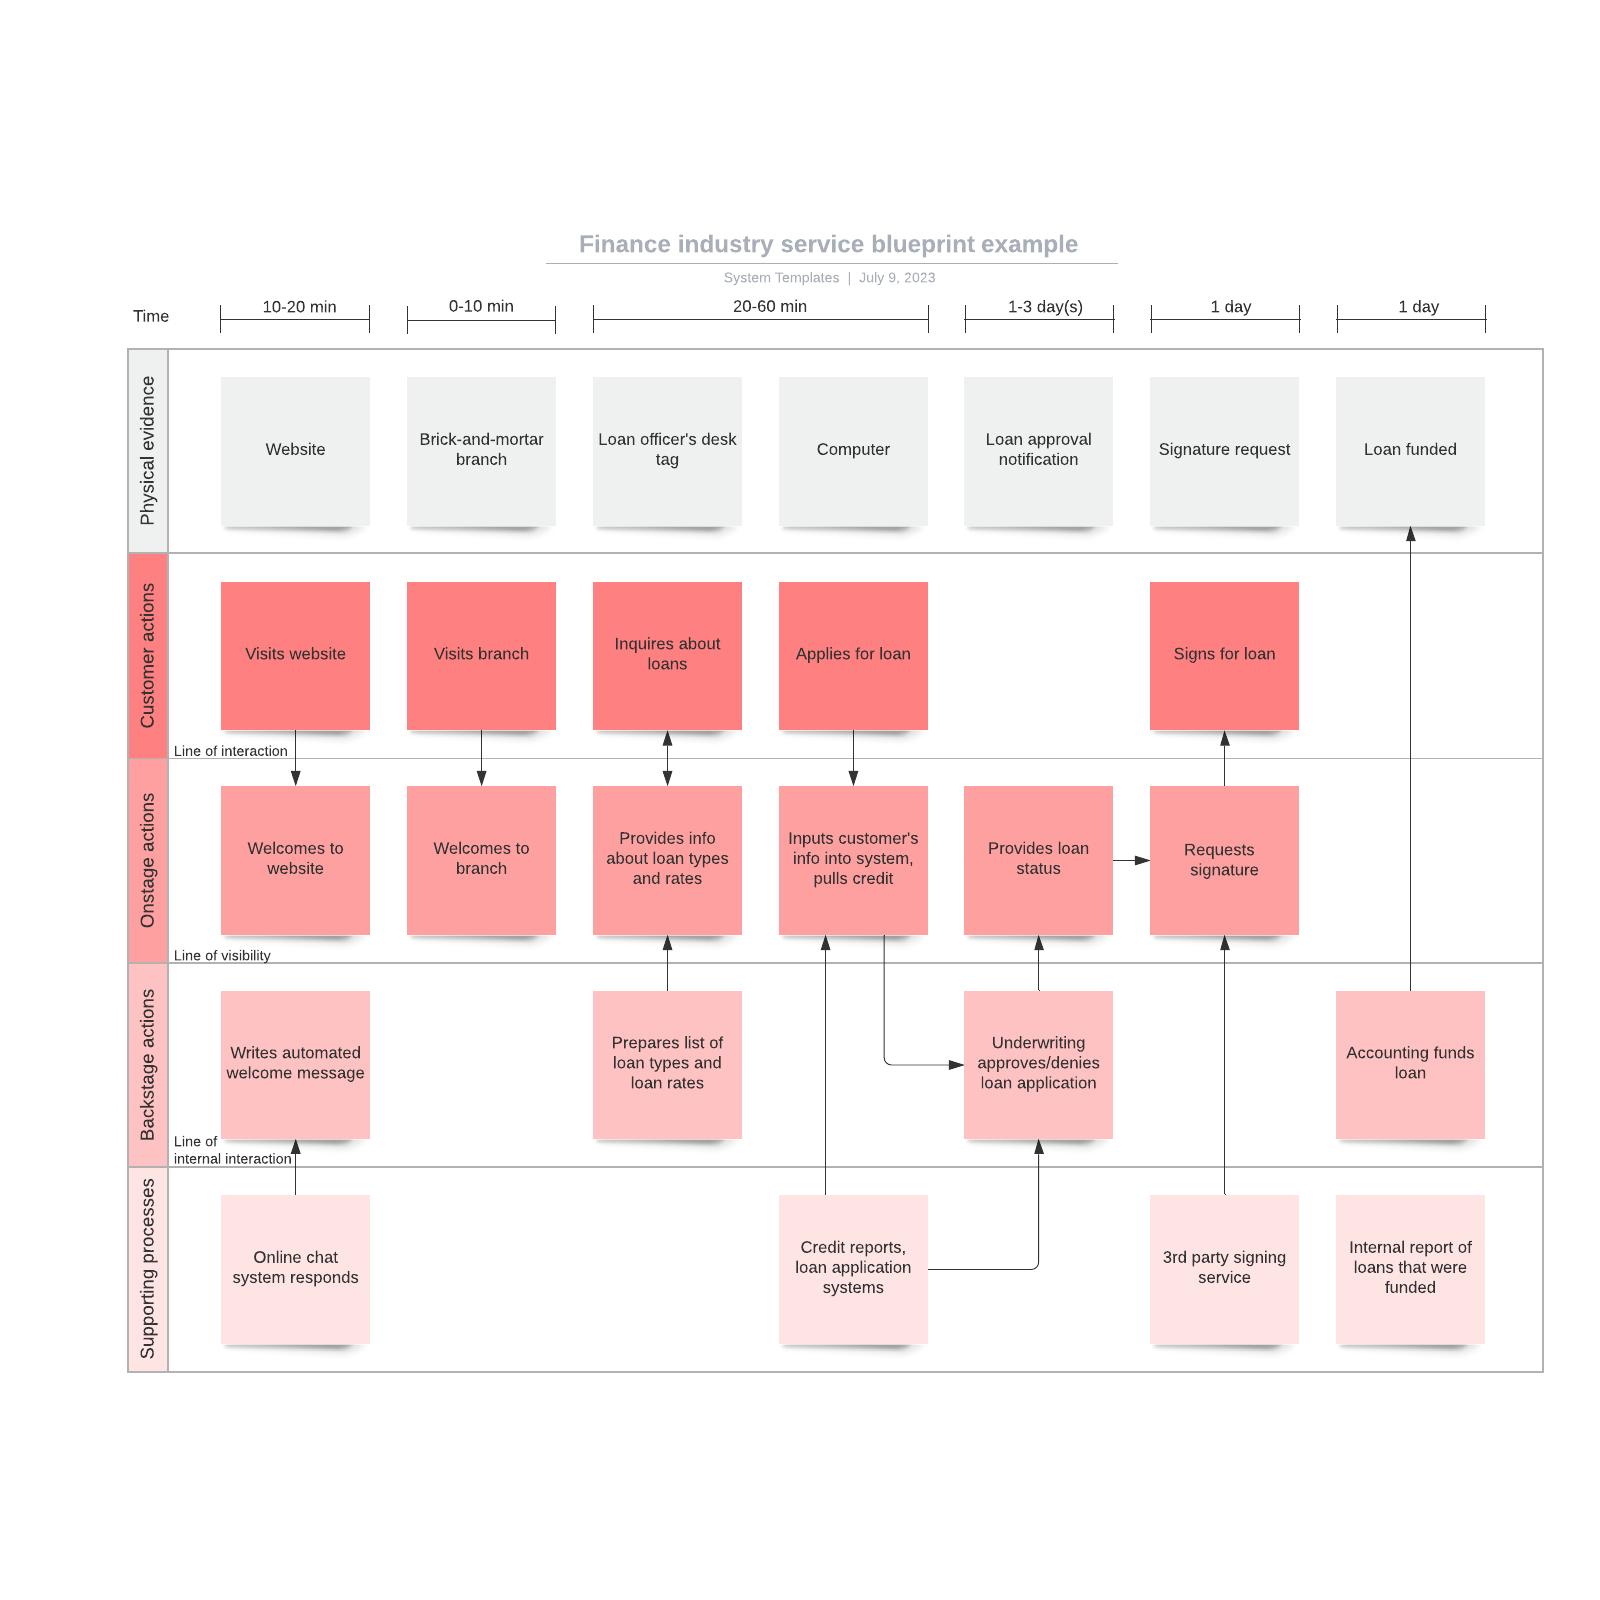 Finance industry service blueprint example